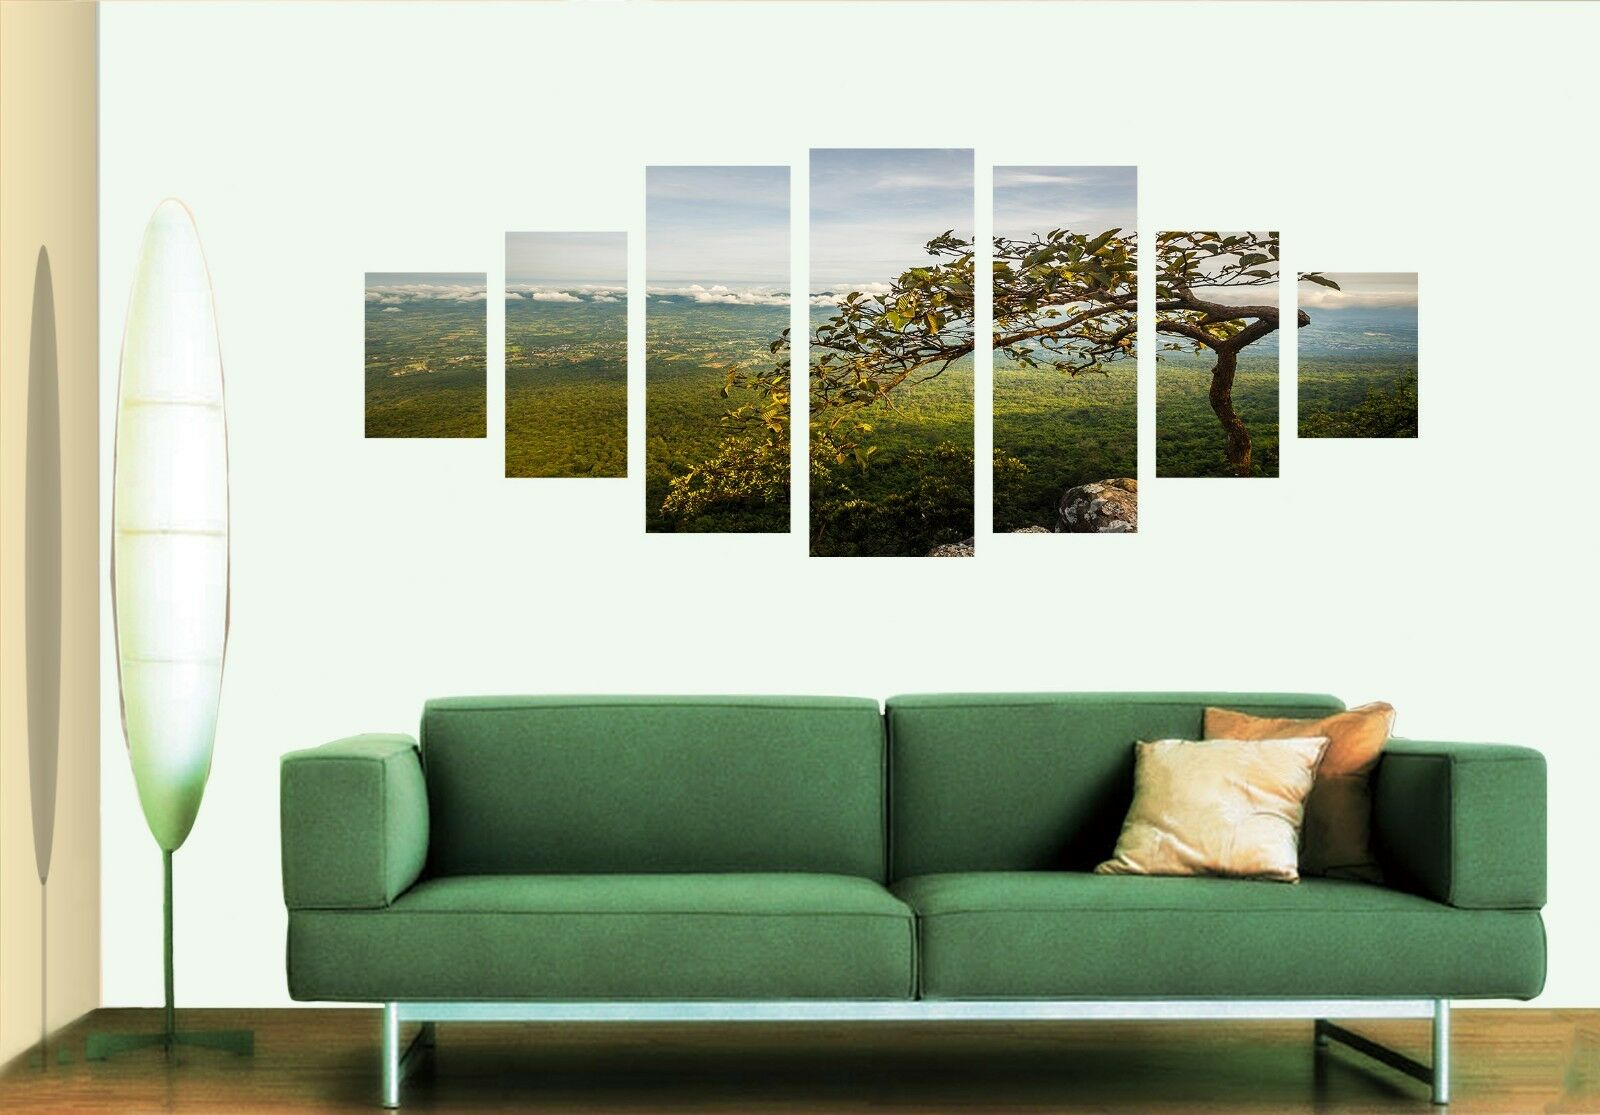 3D Green Tree Lawn 566 Unframed Print Wall Paper Decal Wall Deco Indoor AJ Wall